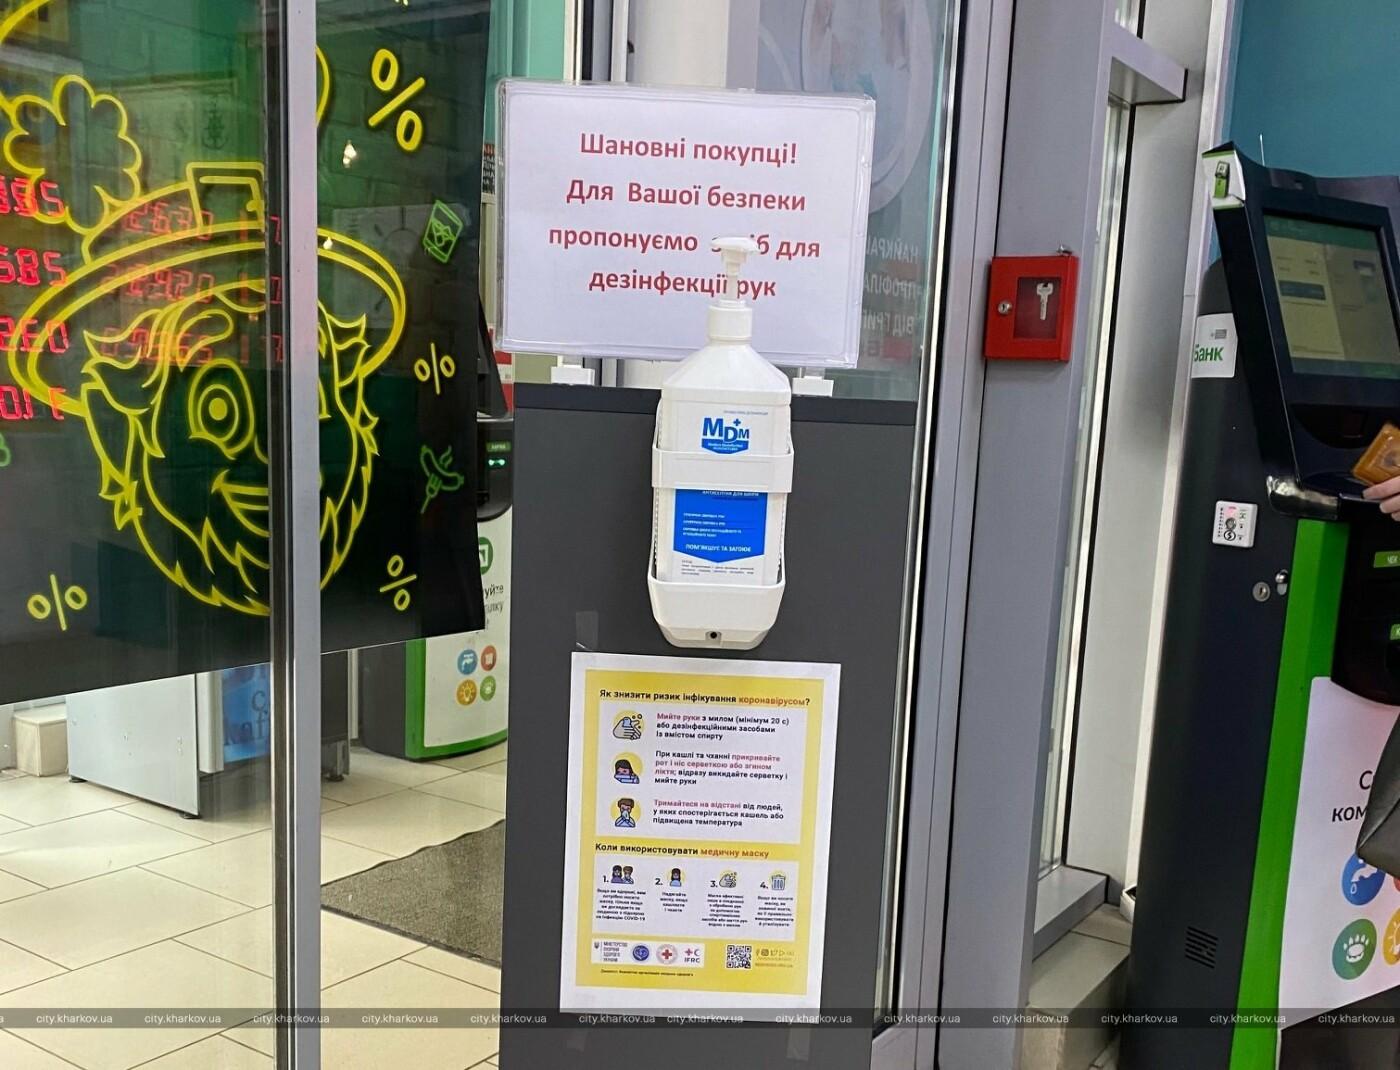 В Харькове проверили работу двух супермаркетов во время карантина, - ФОТО, фото-6